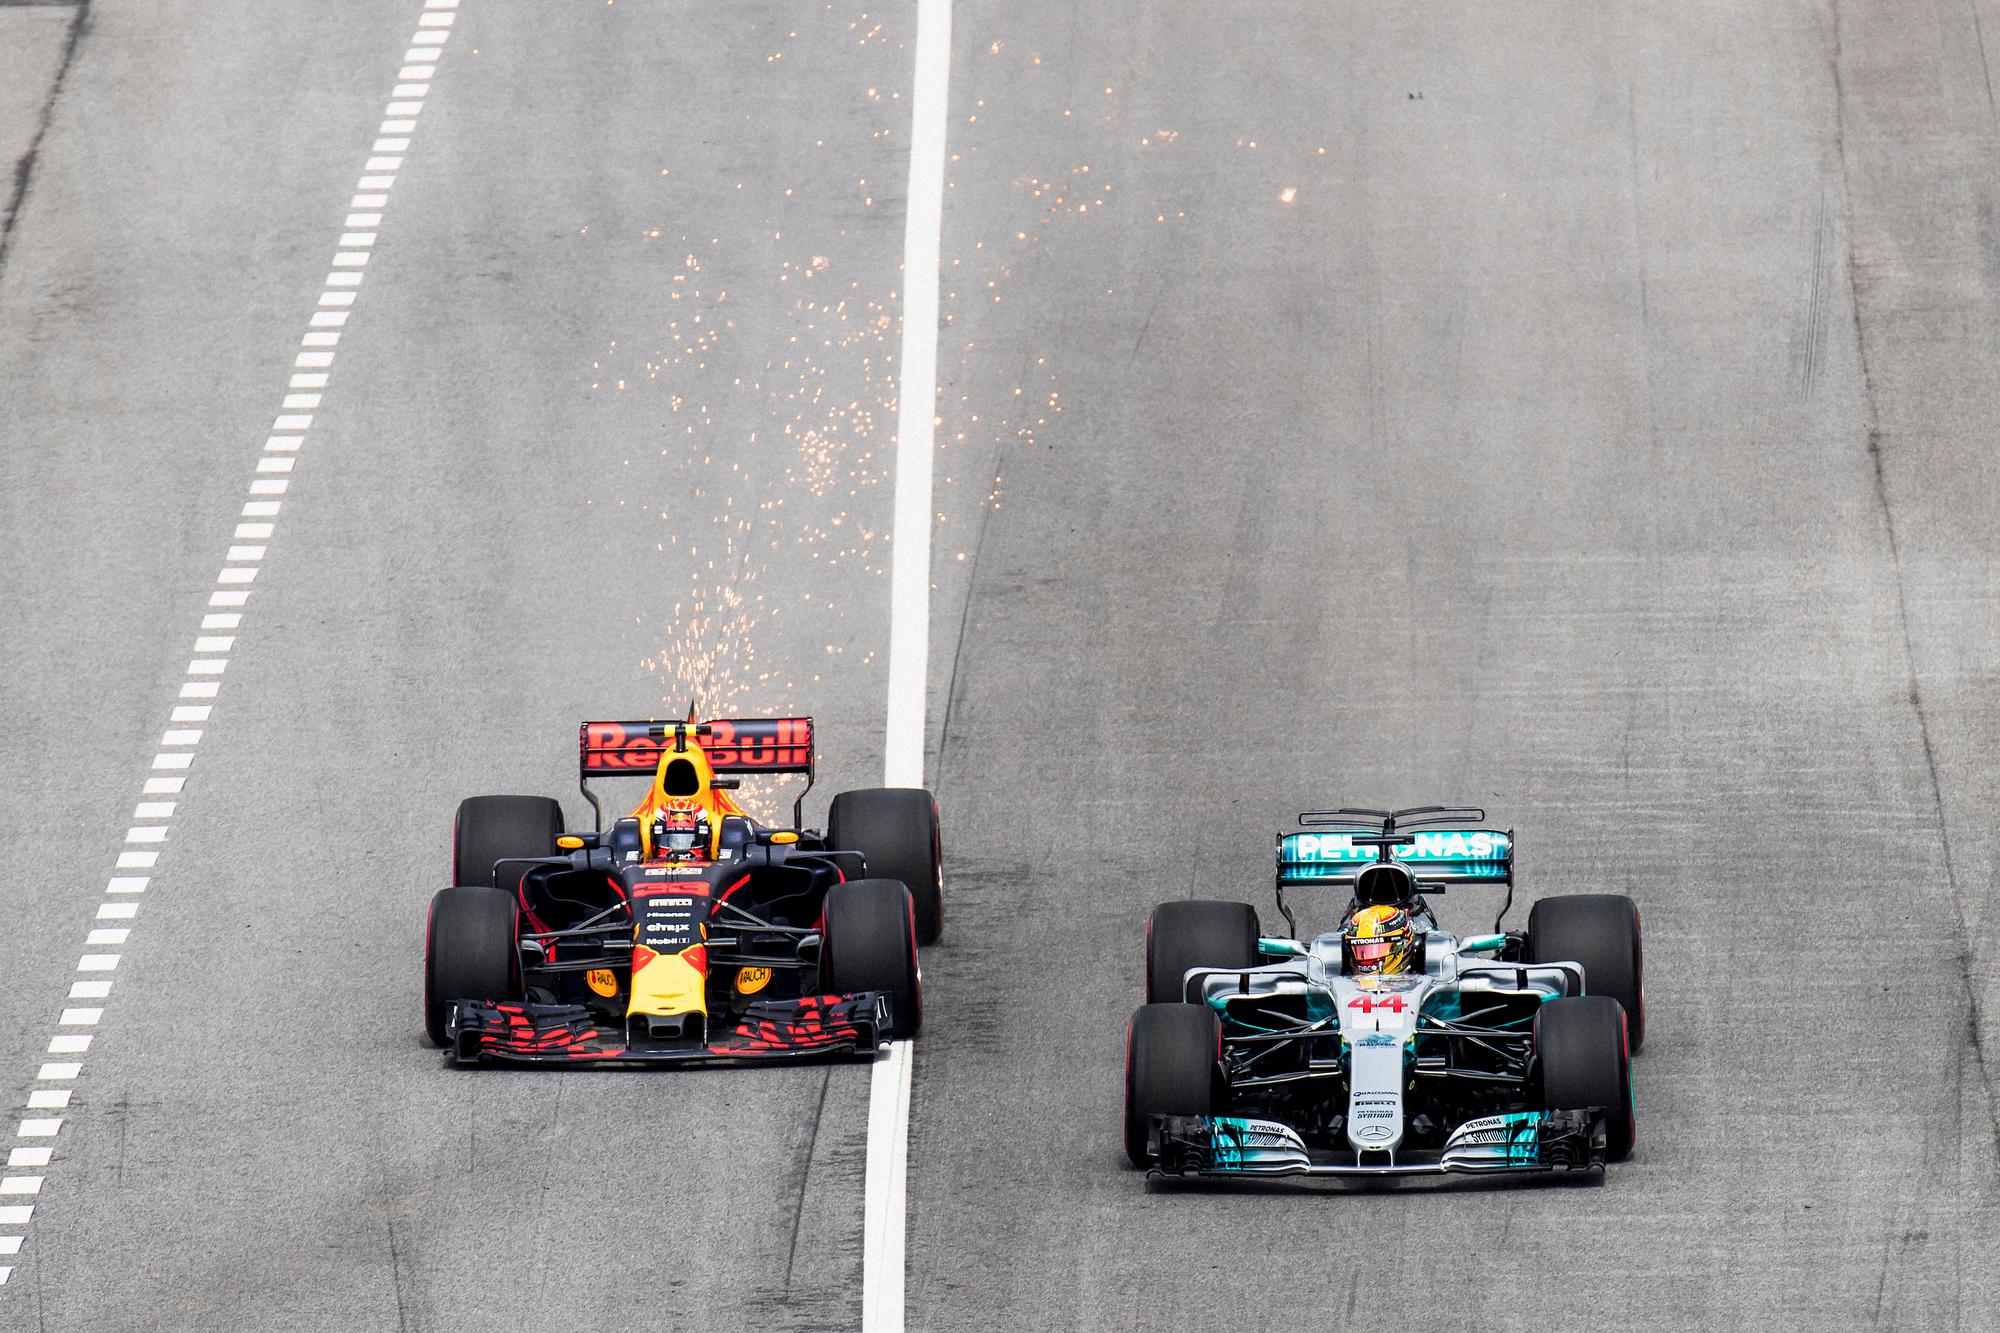 Max Verstappen, Red Bull and Lewis Hamilton, Mercedes. 2017 FIA Formula 1 Championship, Sepang, Malaysia.